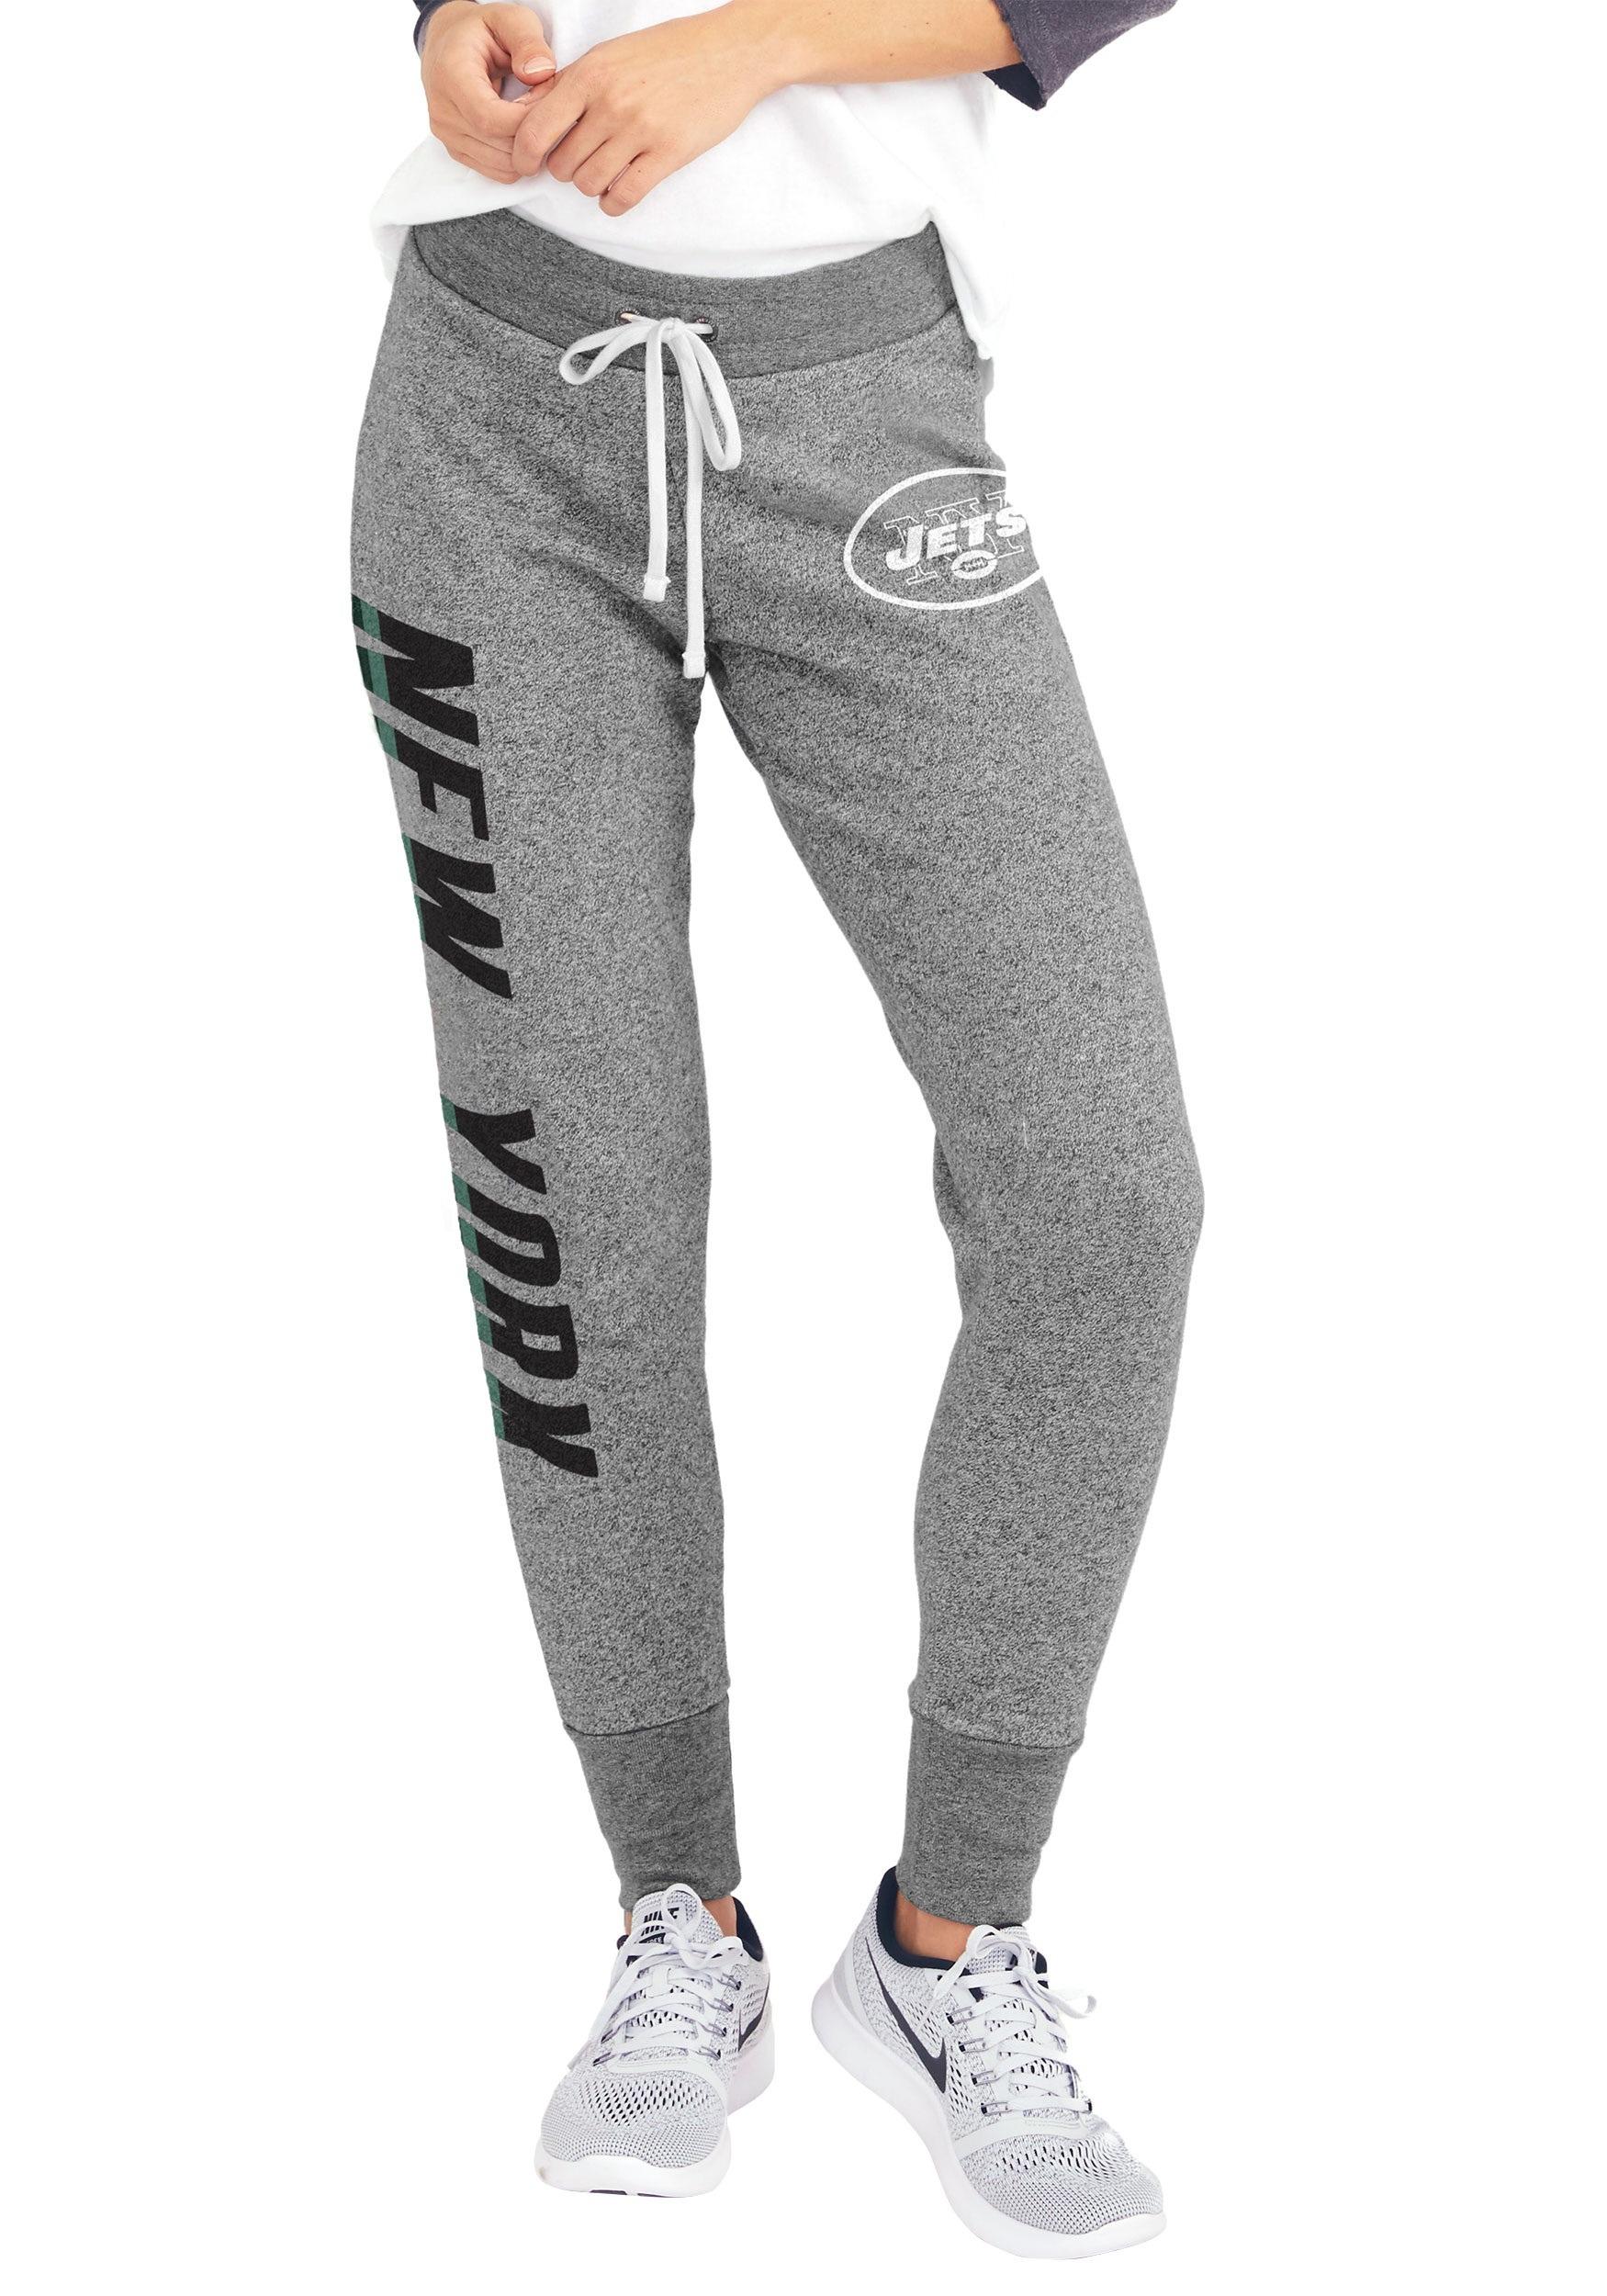 New York Jets Sunday Sweatpants For Women